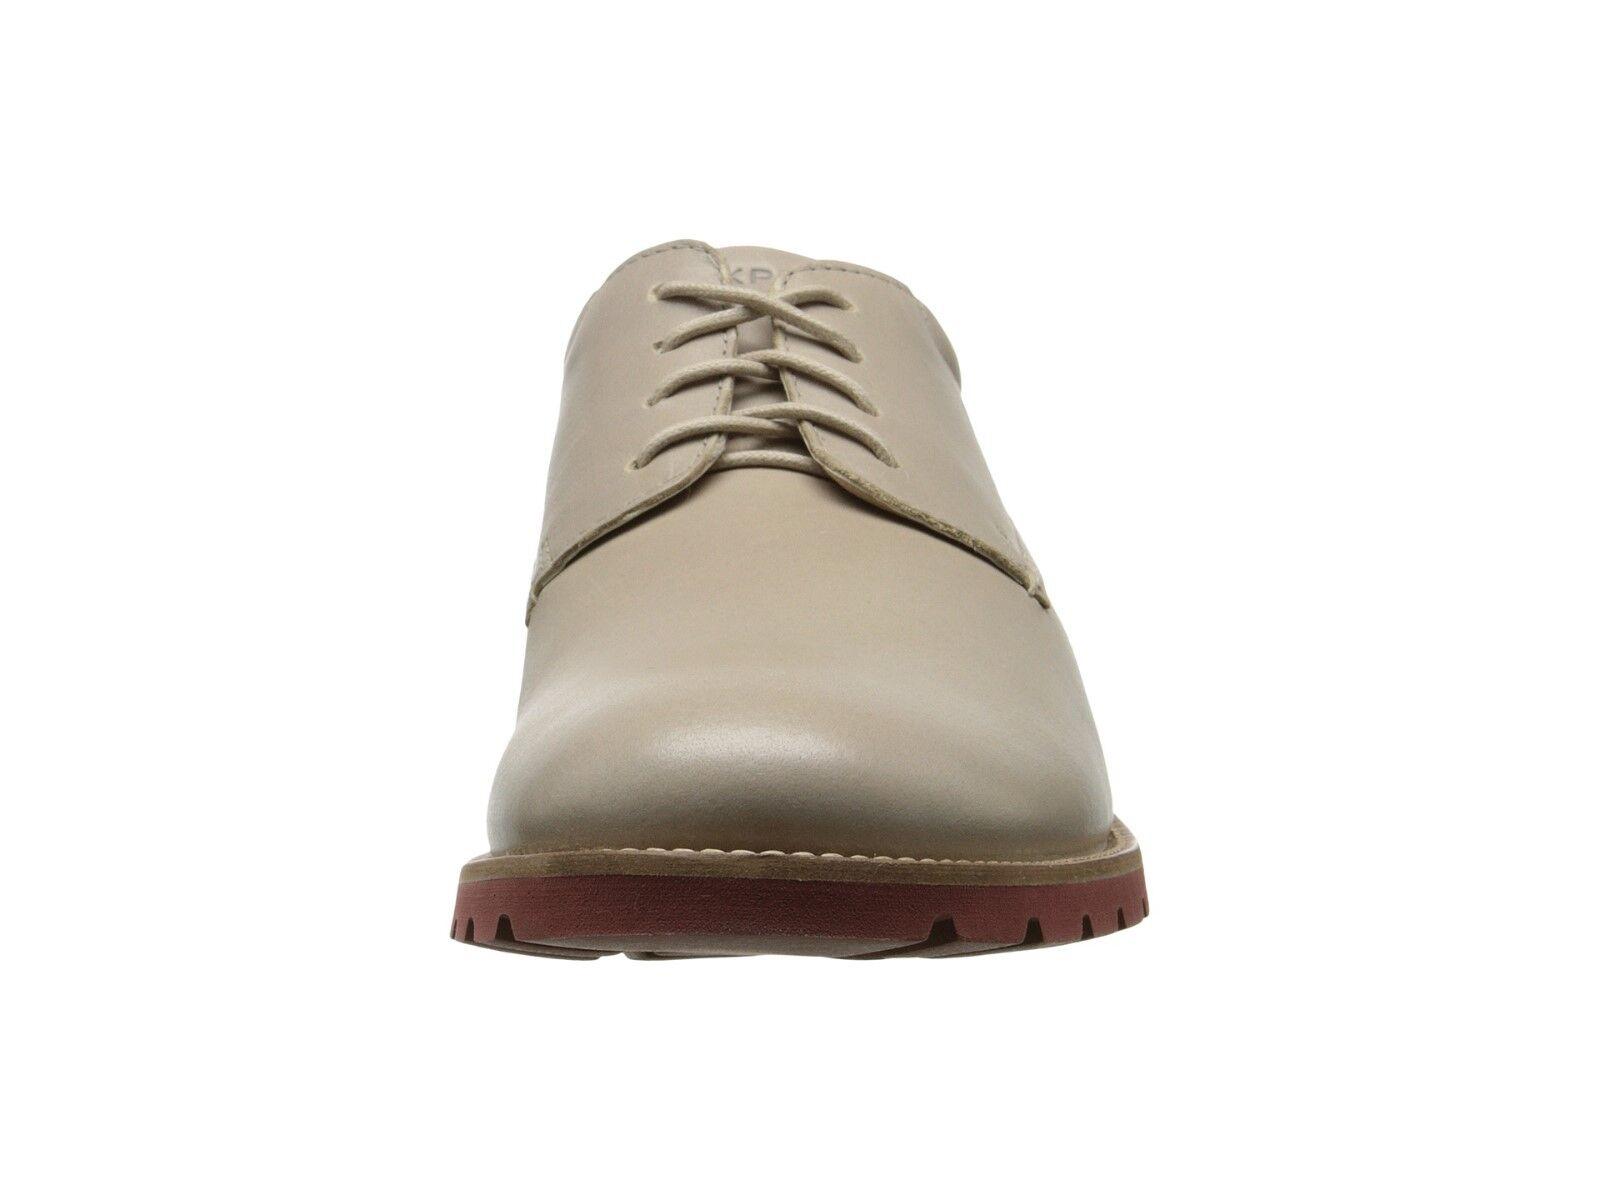 ROCKPORT Colben Plain Toe Pelle Pelle Pelle Oxfords Shoes Uomo 10.5 NEW IN BOX ffcfbc